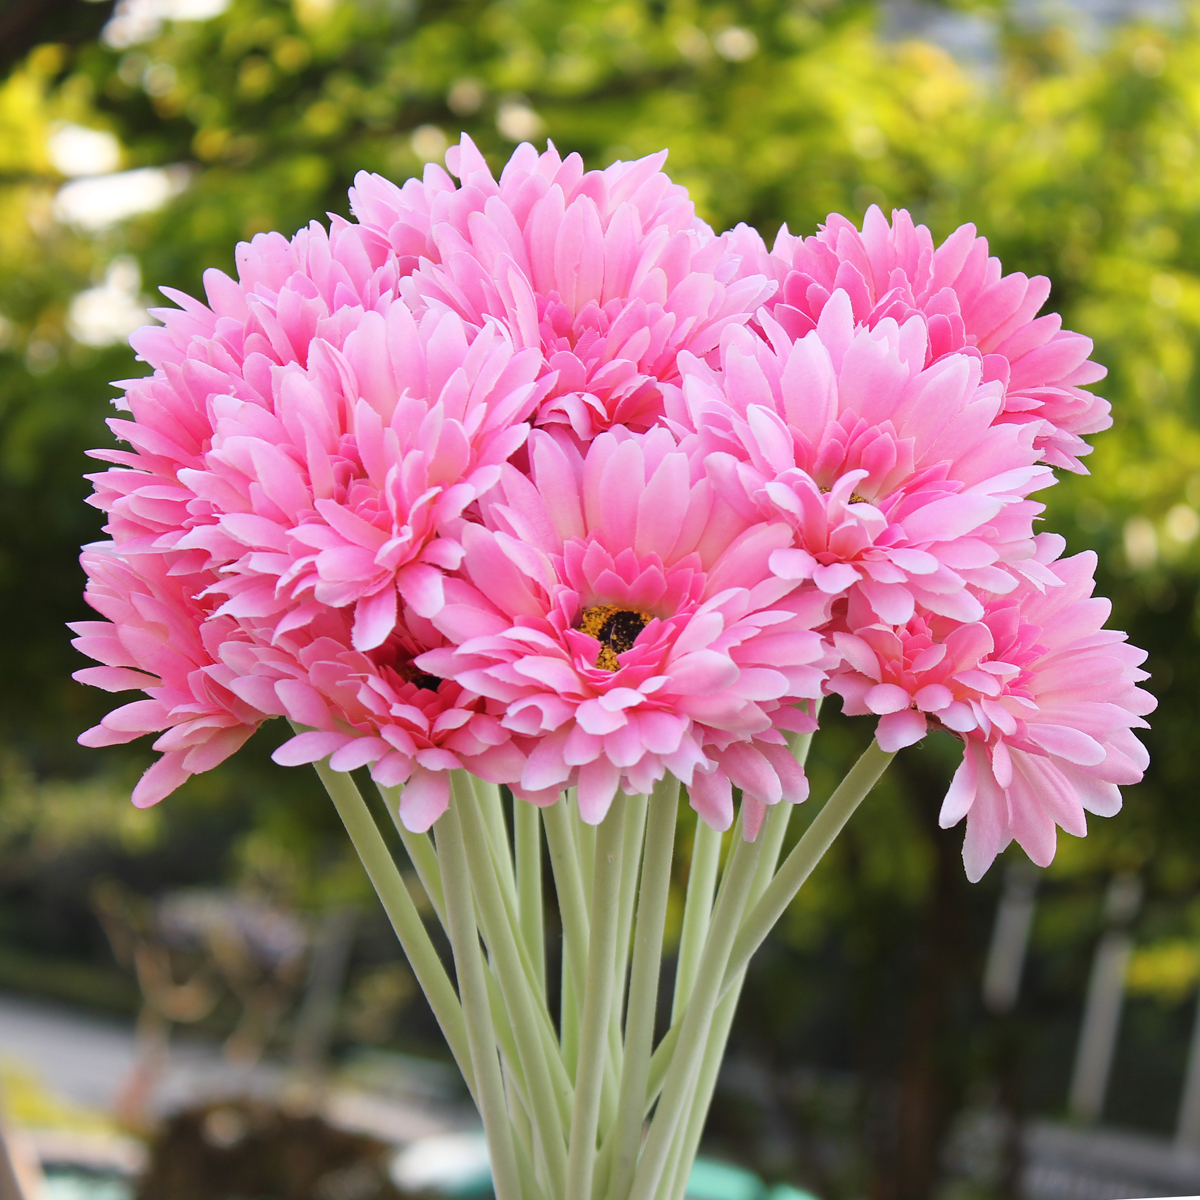 10PCS/Bouquet Artificial Colorful decoration Flower Silk Gerbera Flowers Wedding Party Home Garden Office Decoration